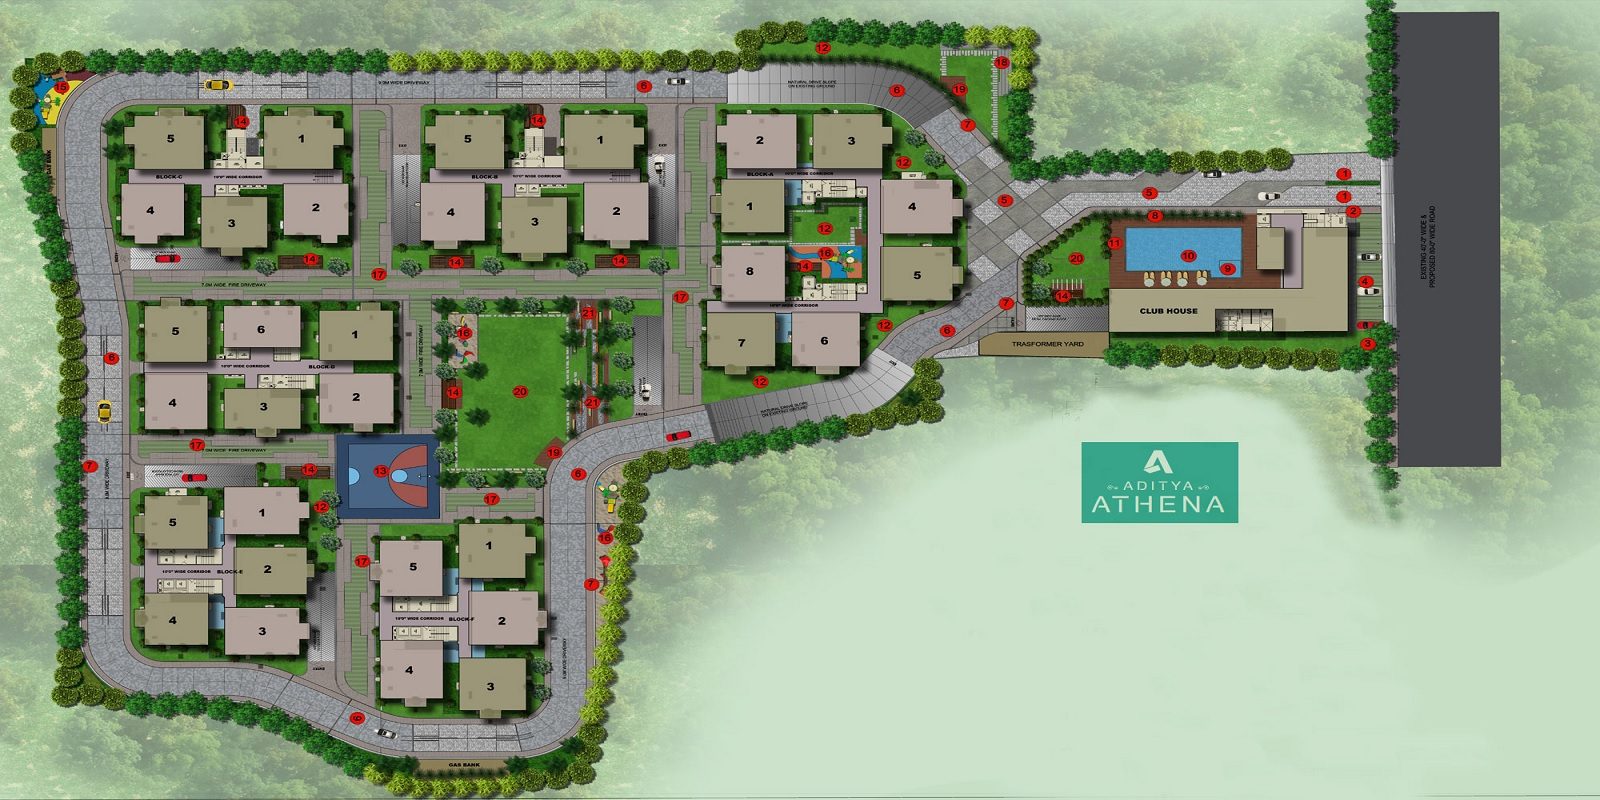 sri aditya athena master plan image5